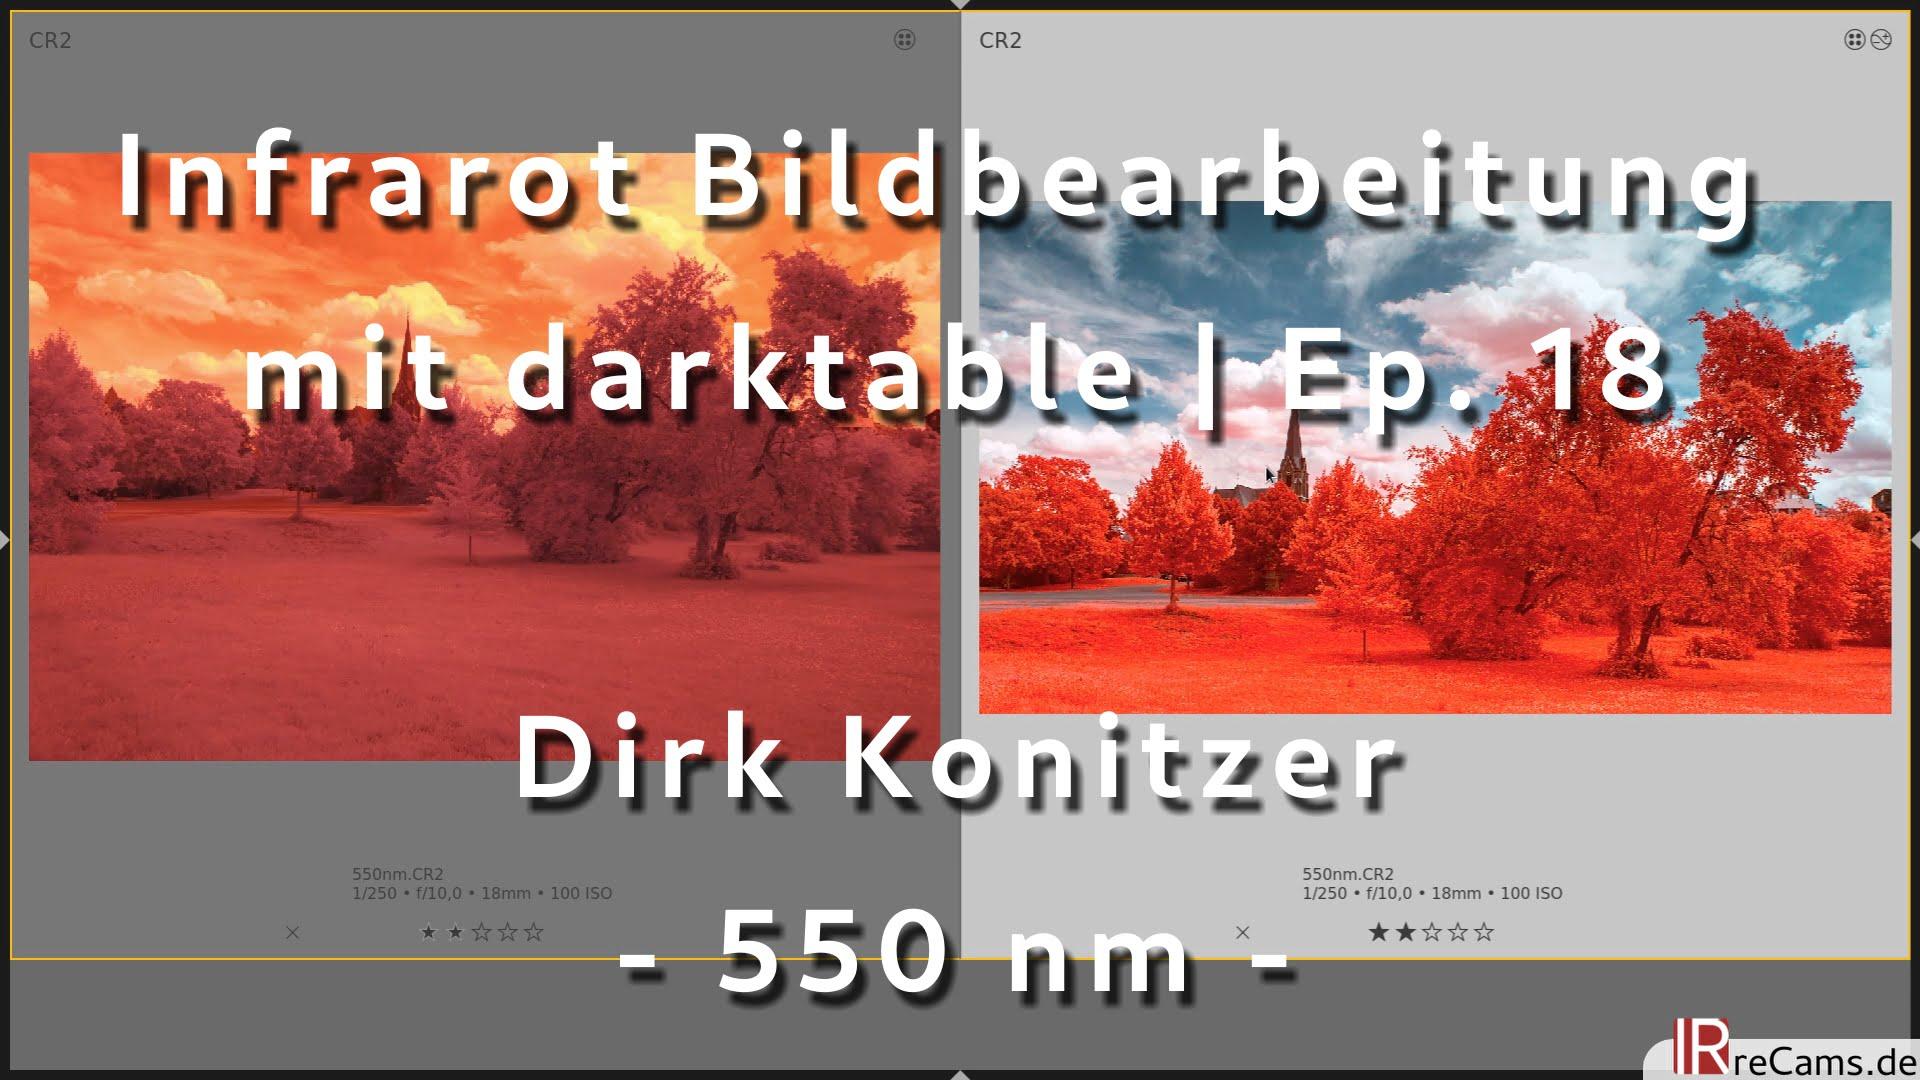 Dirk Konitzer - 550 nm Infrarot für Kodak Aerochrome Look